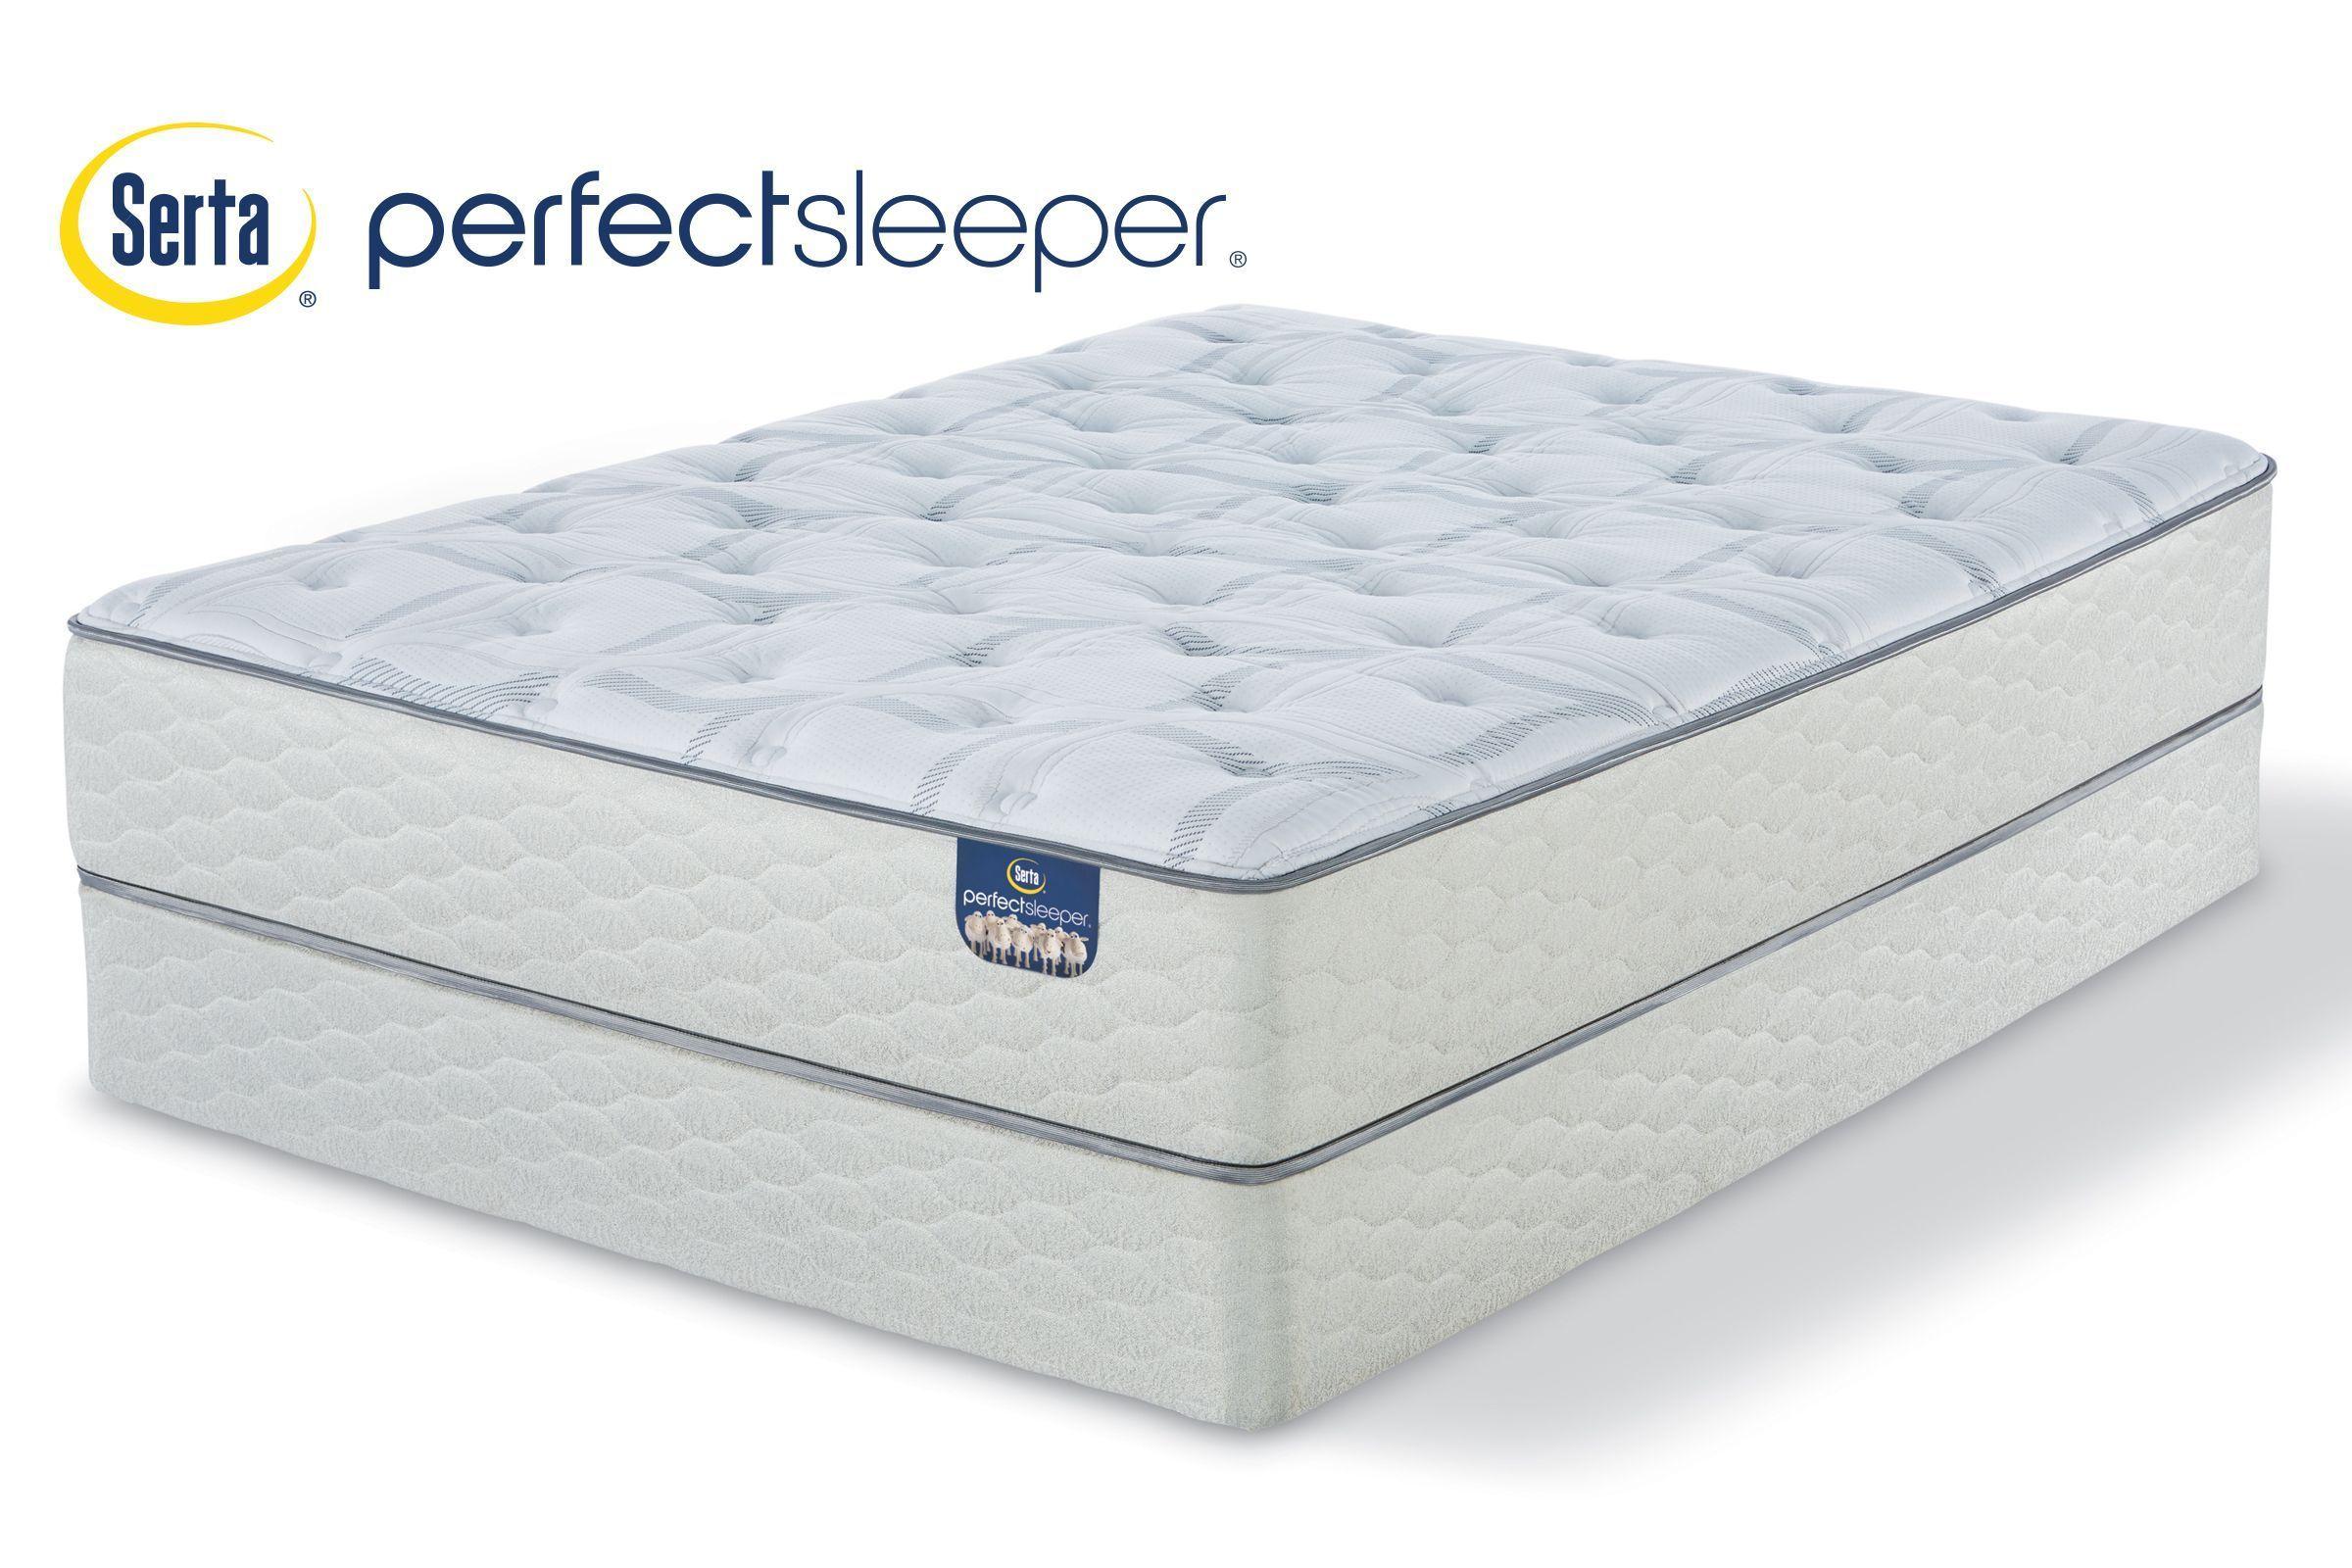 Serta Perfect Sleeper Leary Plush King Mattress With 2 Low